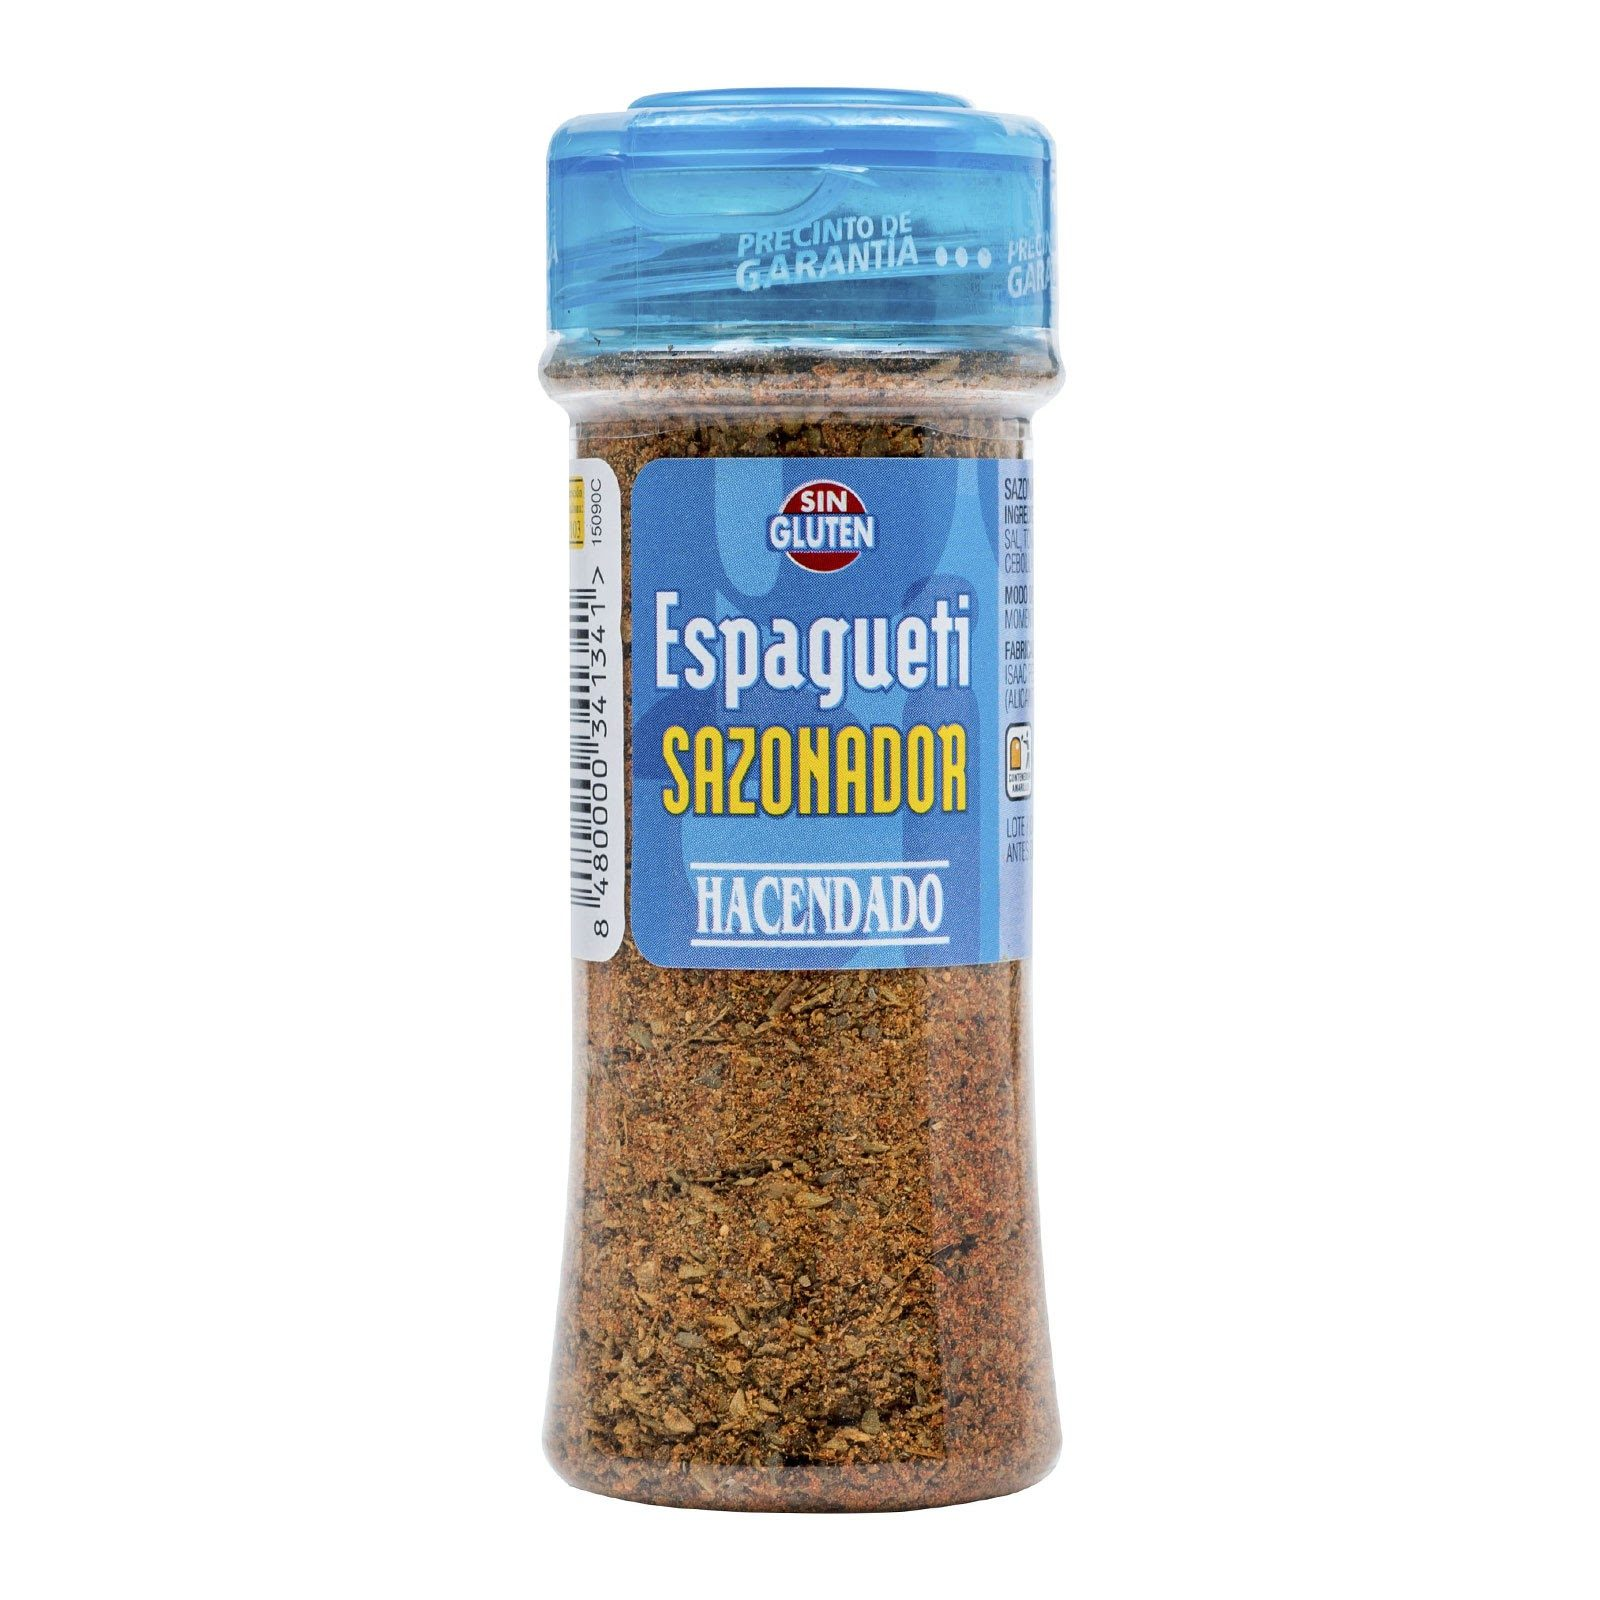 sazonador-para-espagueti-hacendado-mercadona-1-5849799